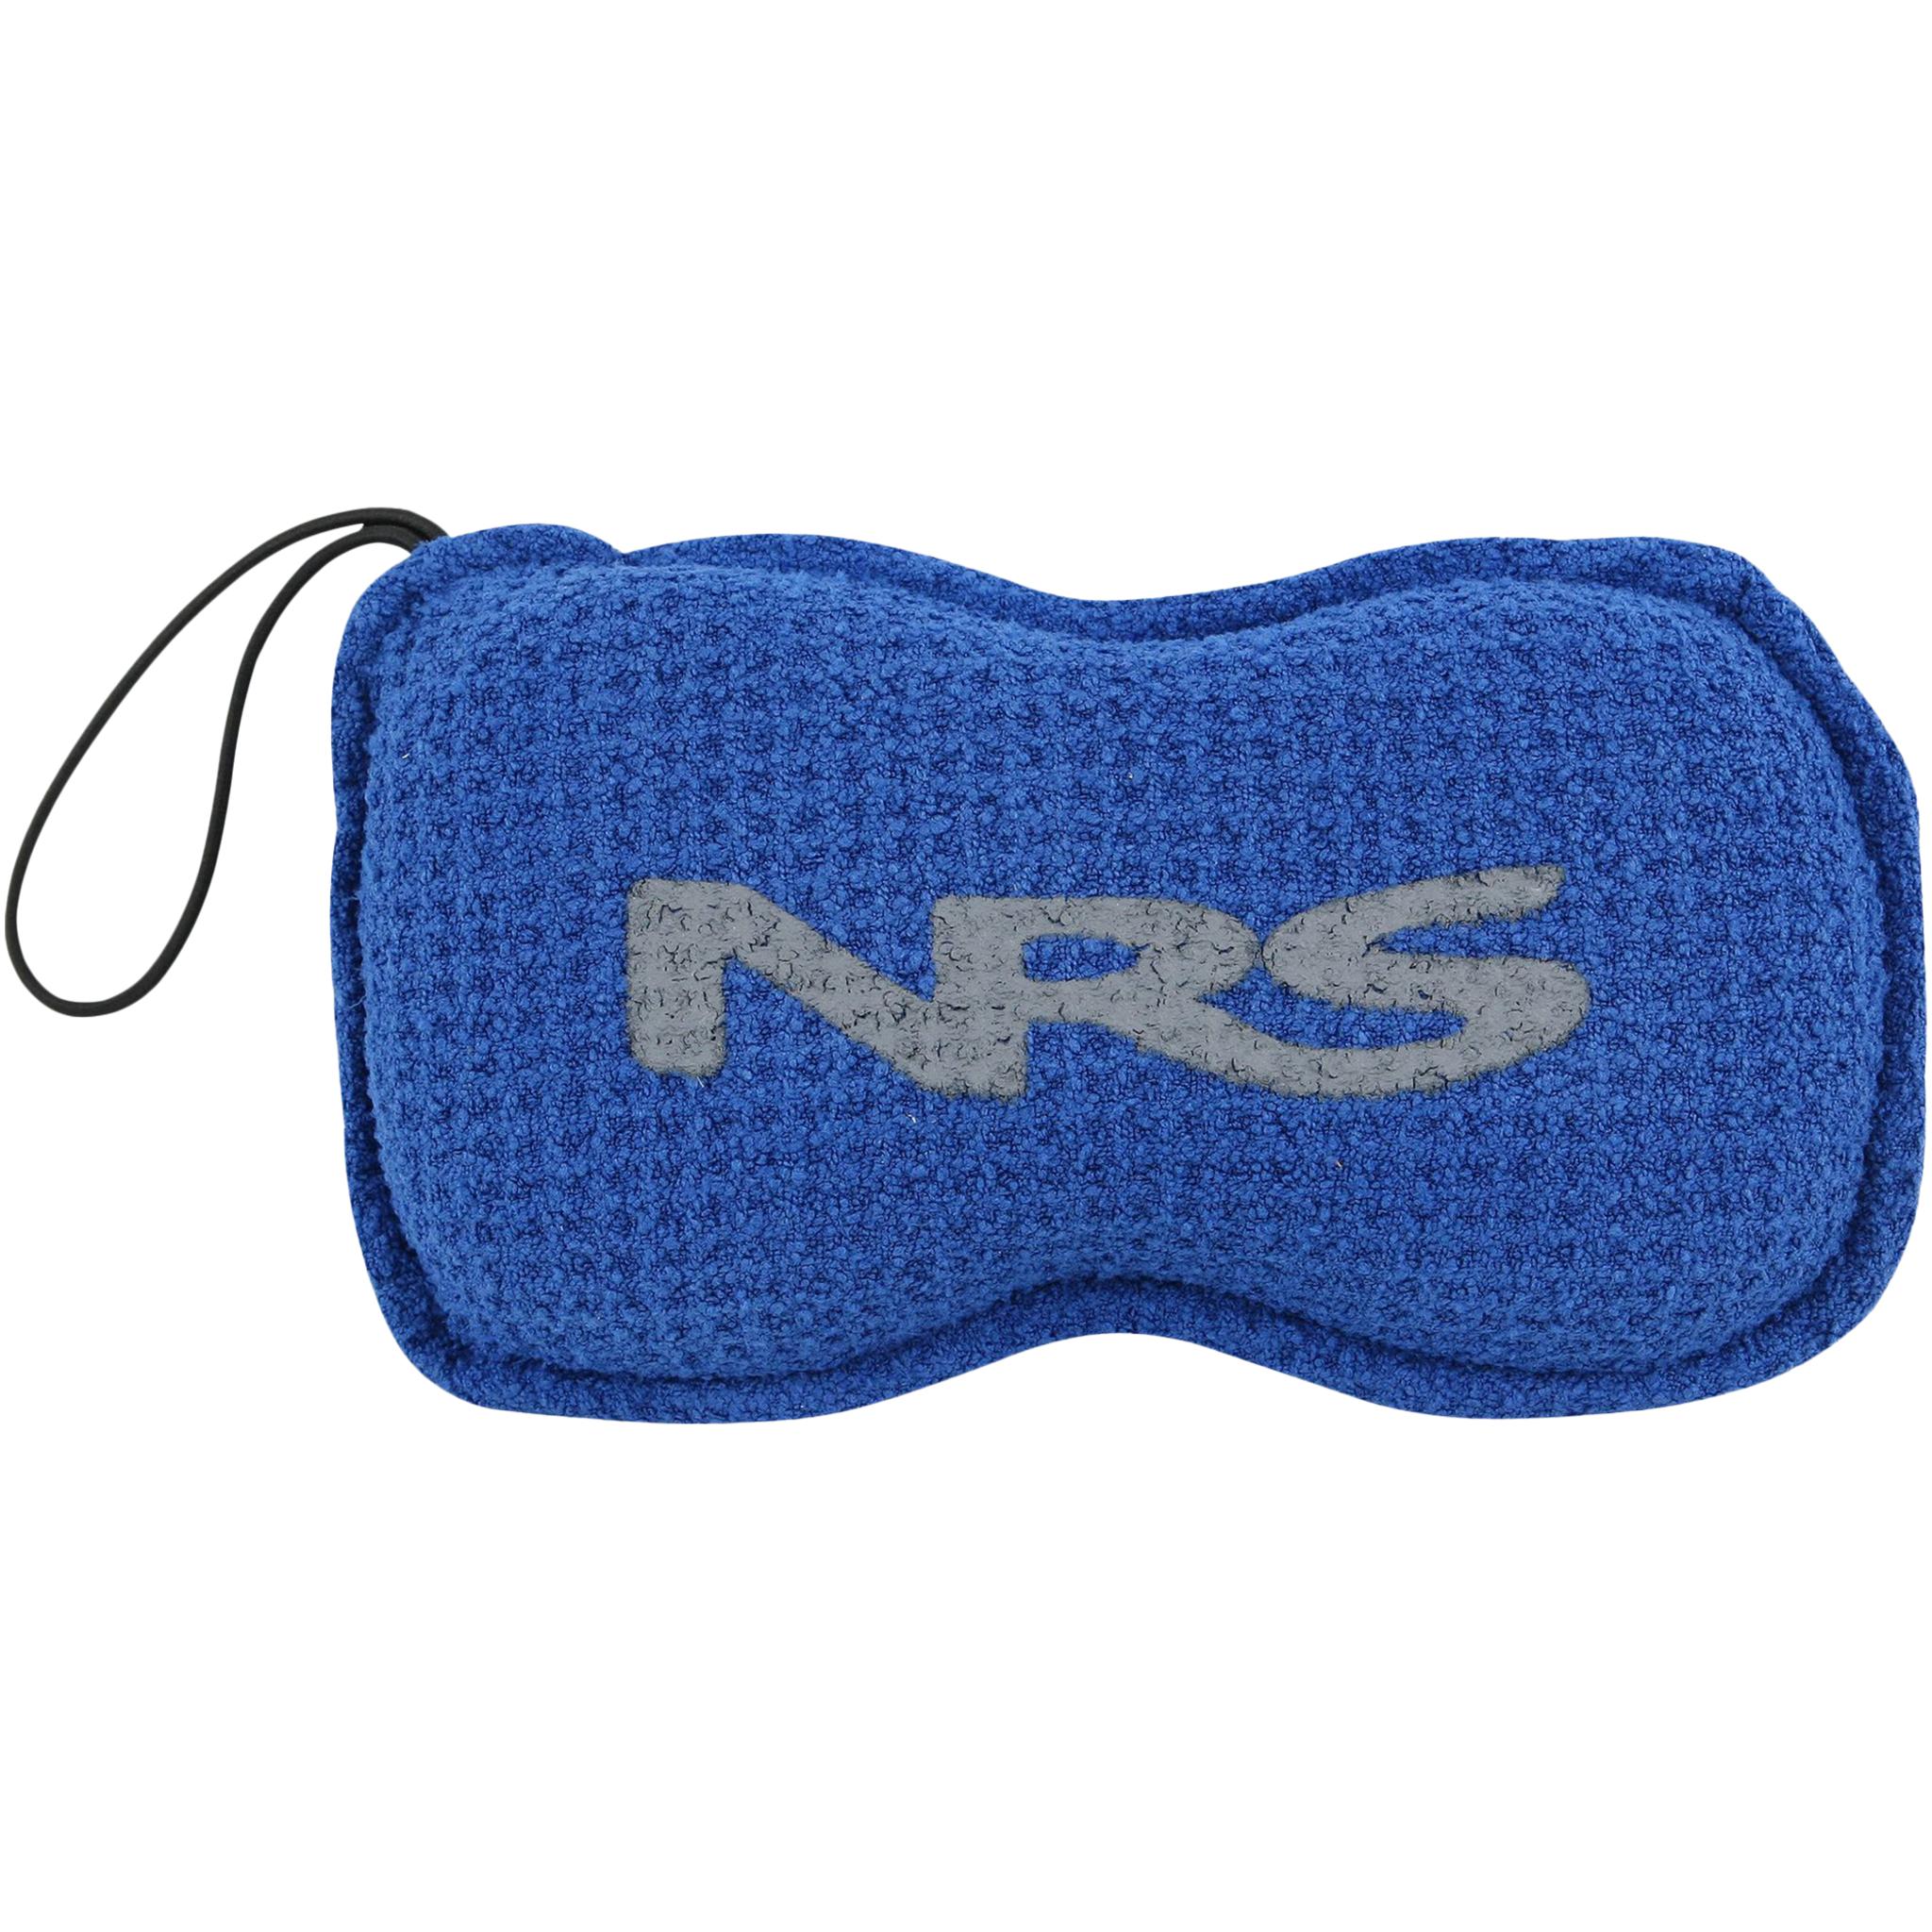 NRS Deluxe Boat Sponge, svamp STD blue